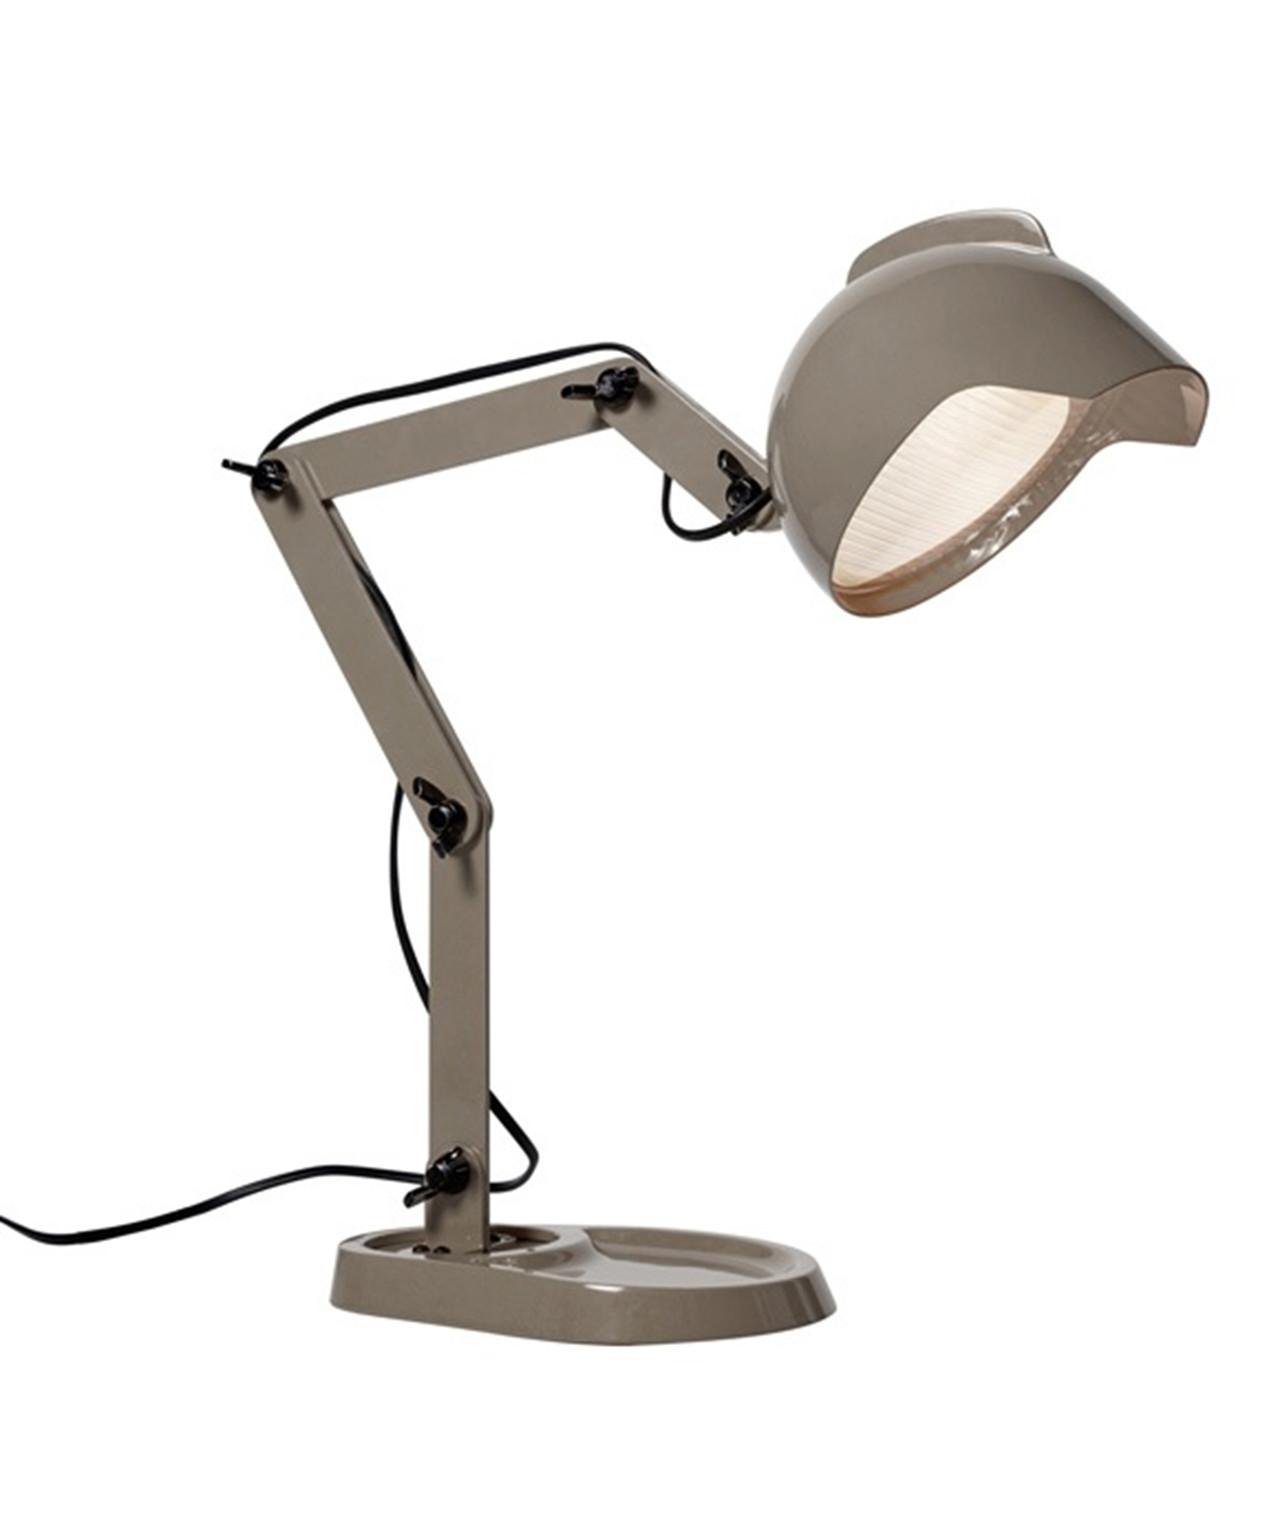 Duii bordlampe grå